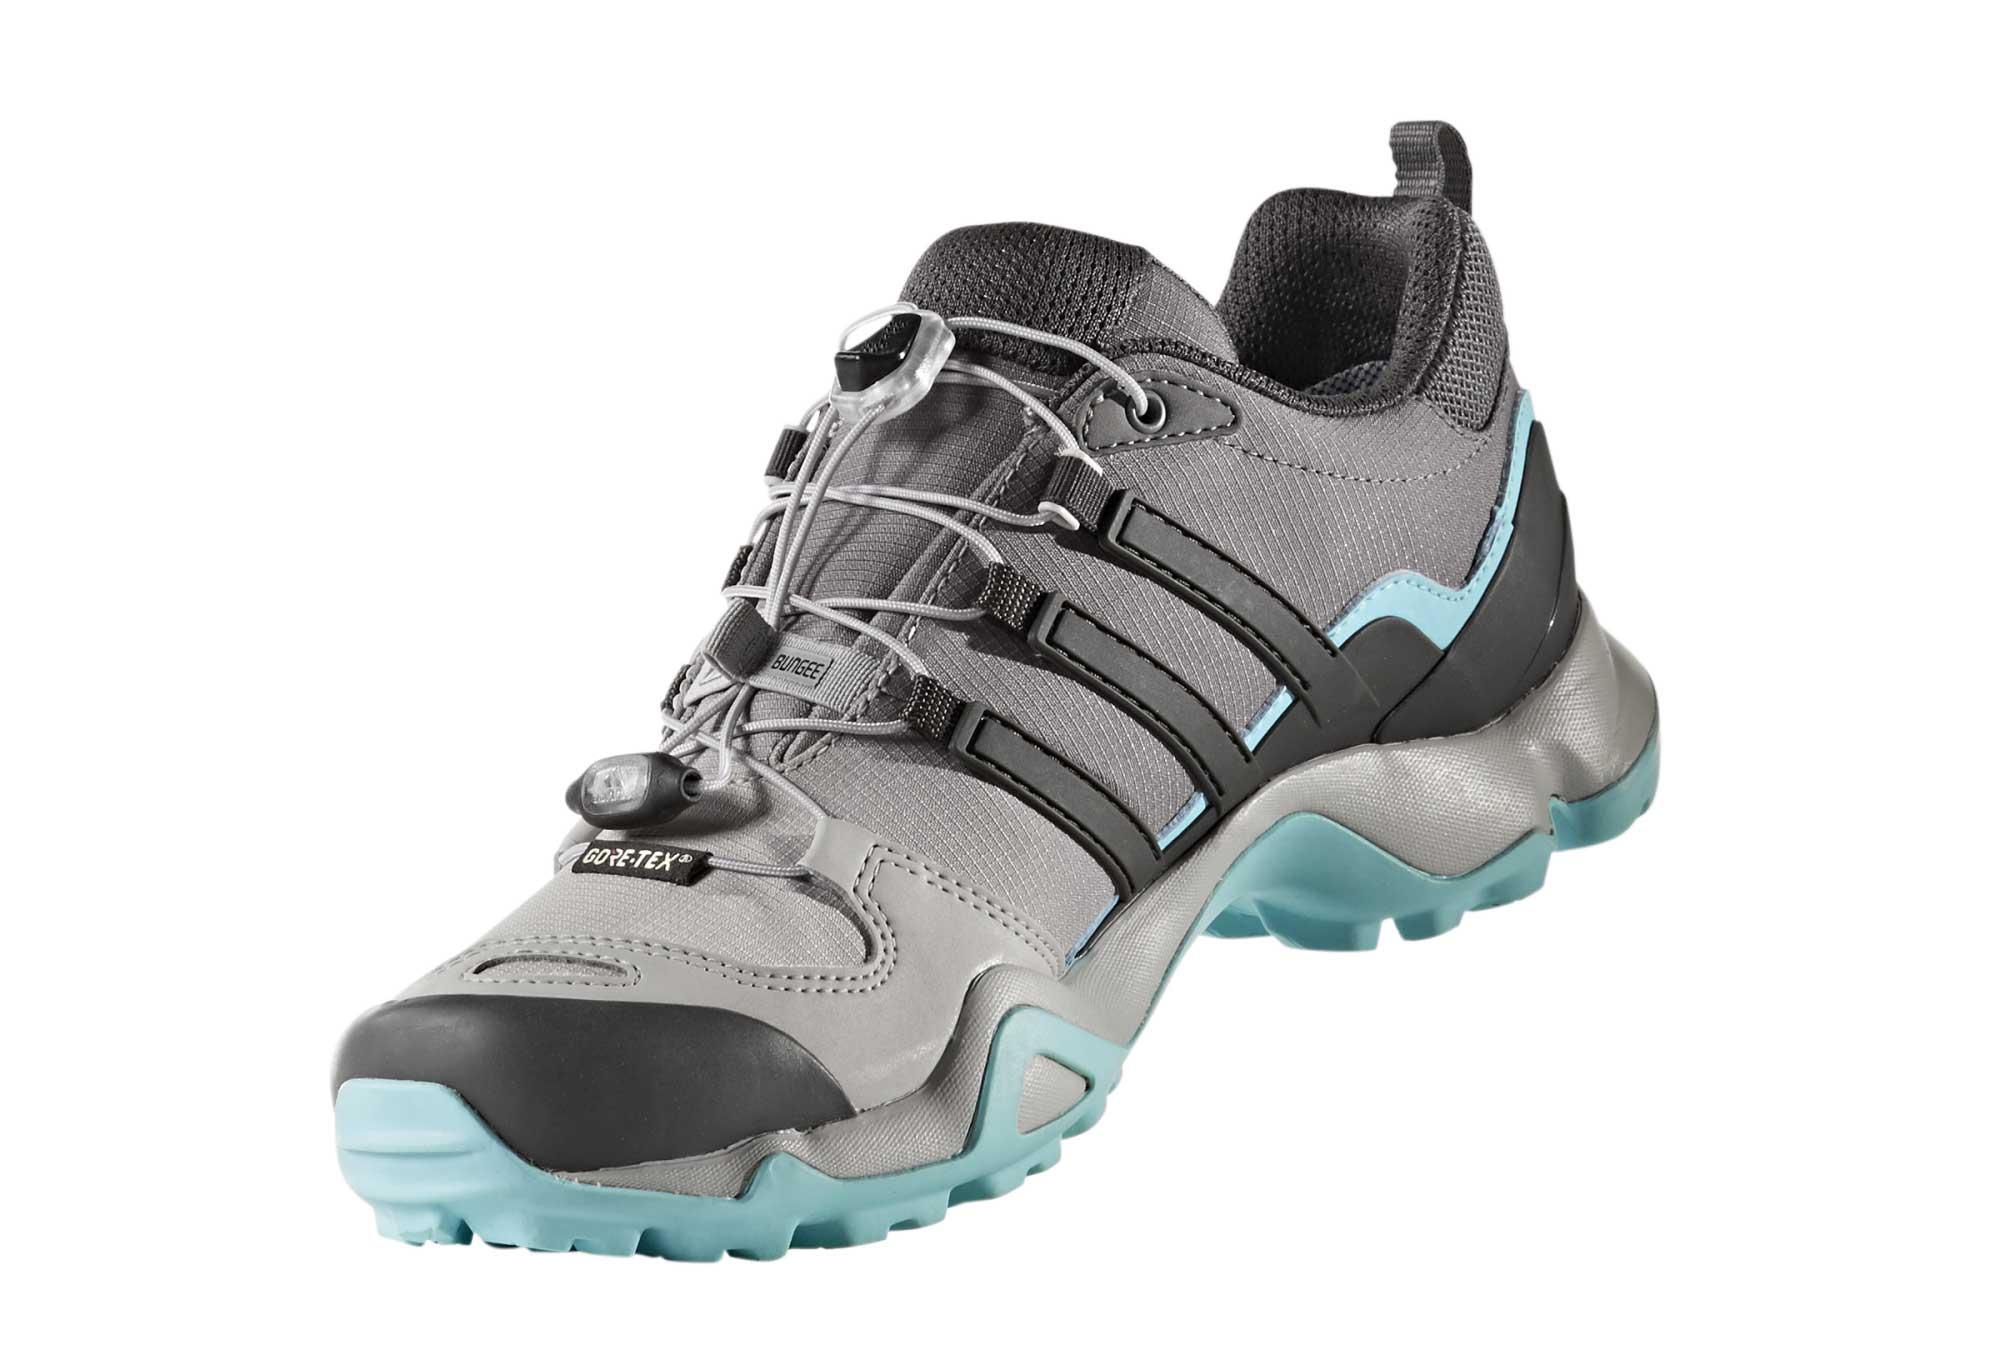 R Swift Grey Light Women Terrex Blue Adidas Gtx Running 8wnOkP0